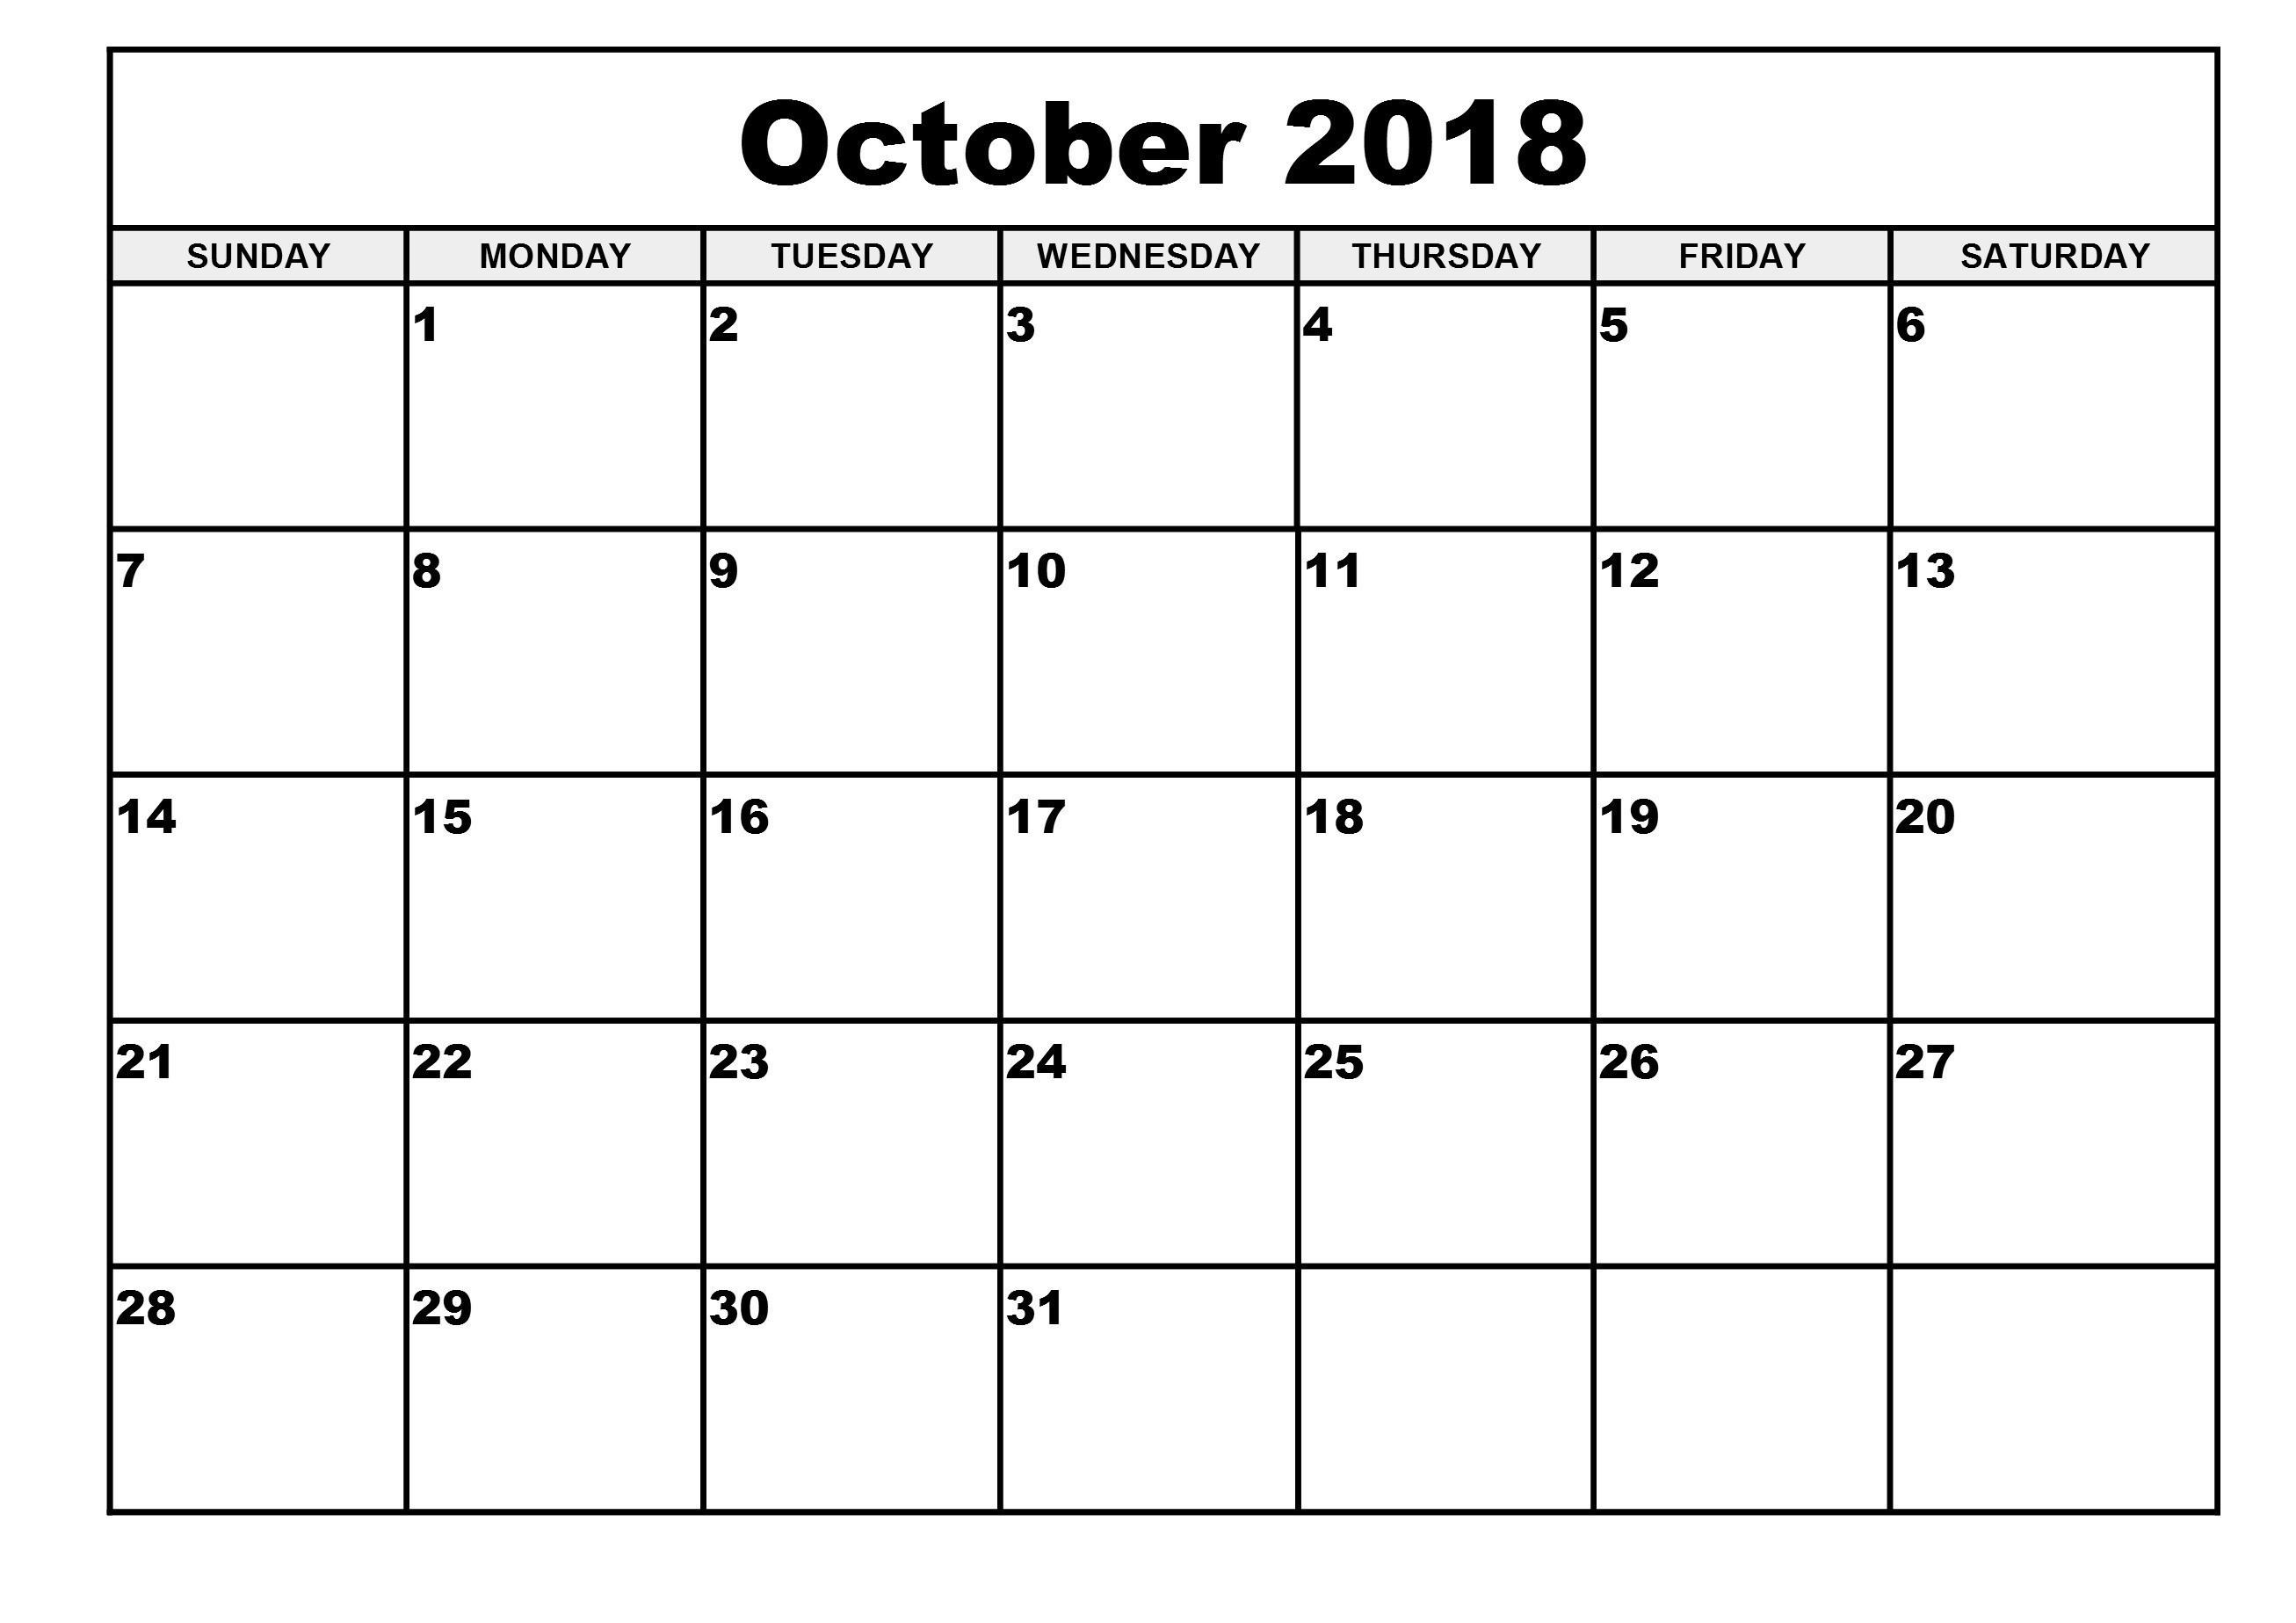 Jullian Calendar  Yatay.horizonconsulting.co with regard to Quadax Julian Calendar 2020